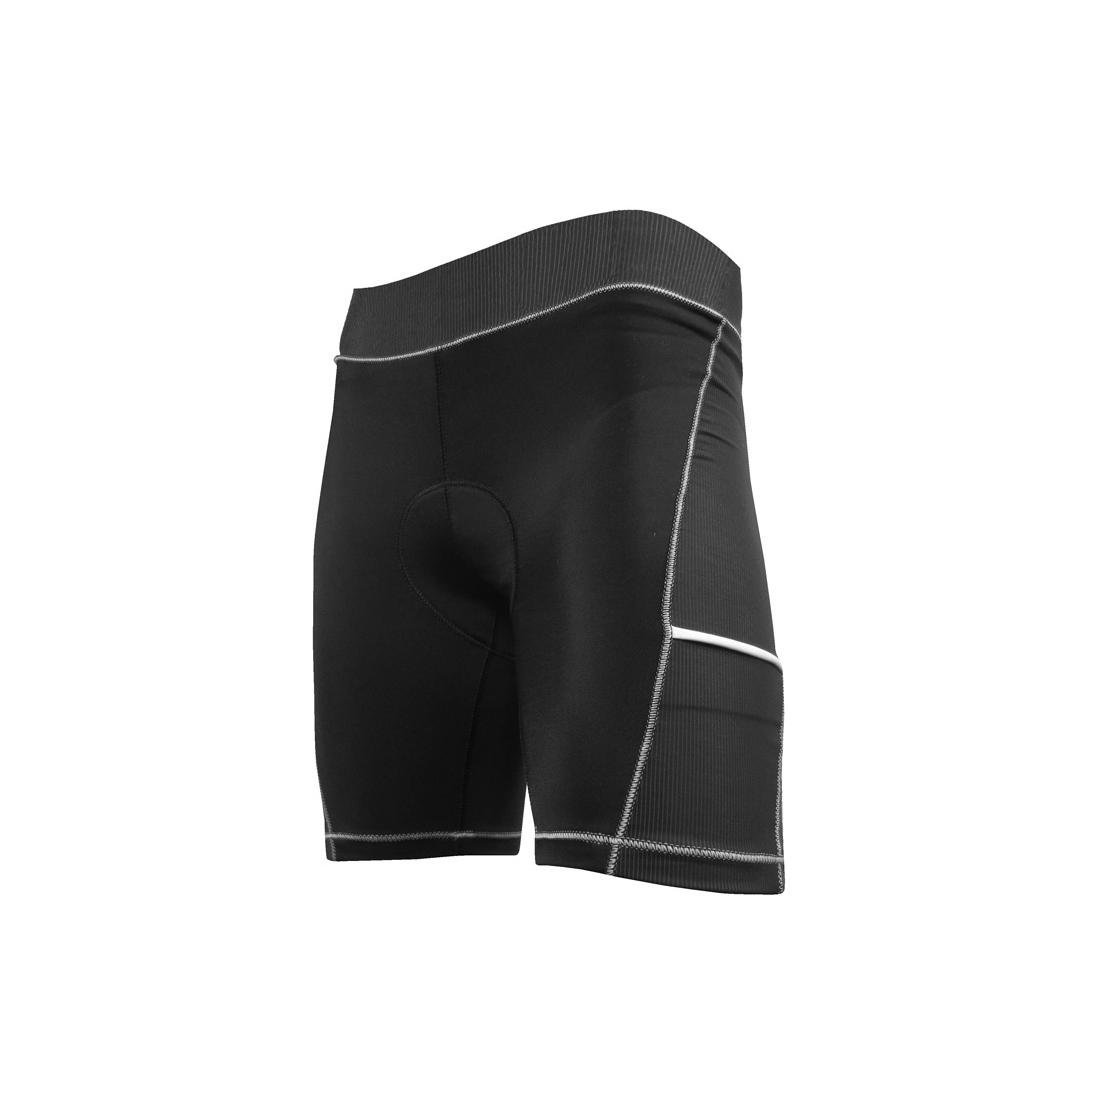 Bike L628 womens compression softball soccer sliding shorts NEW